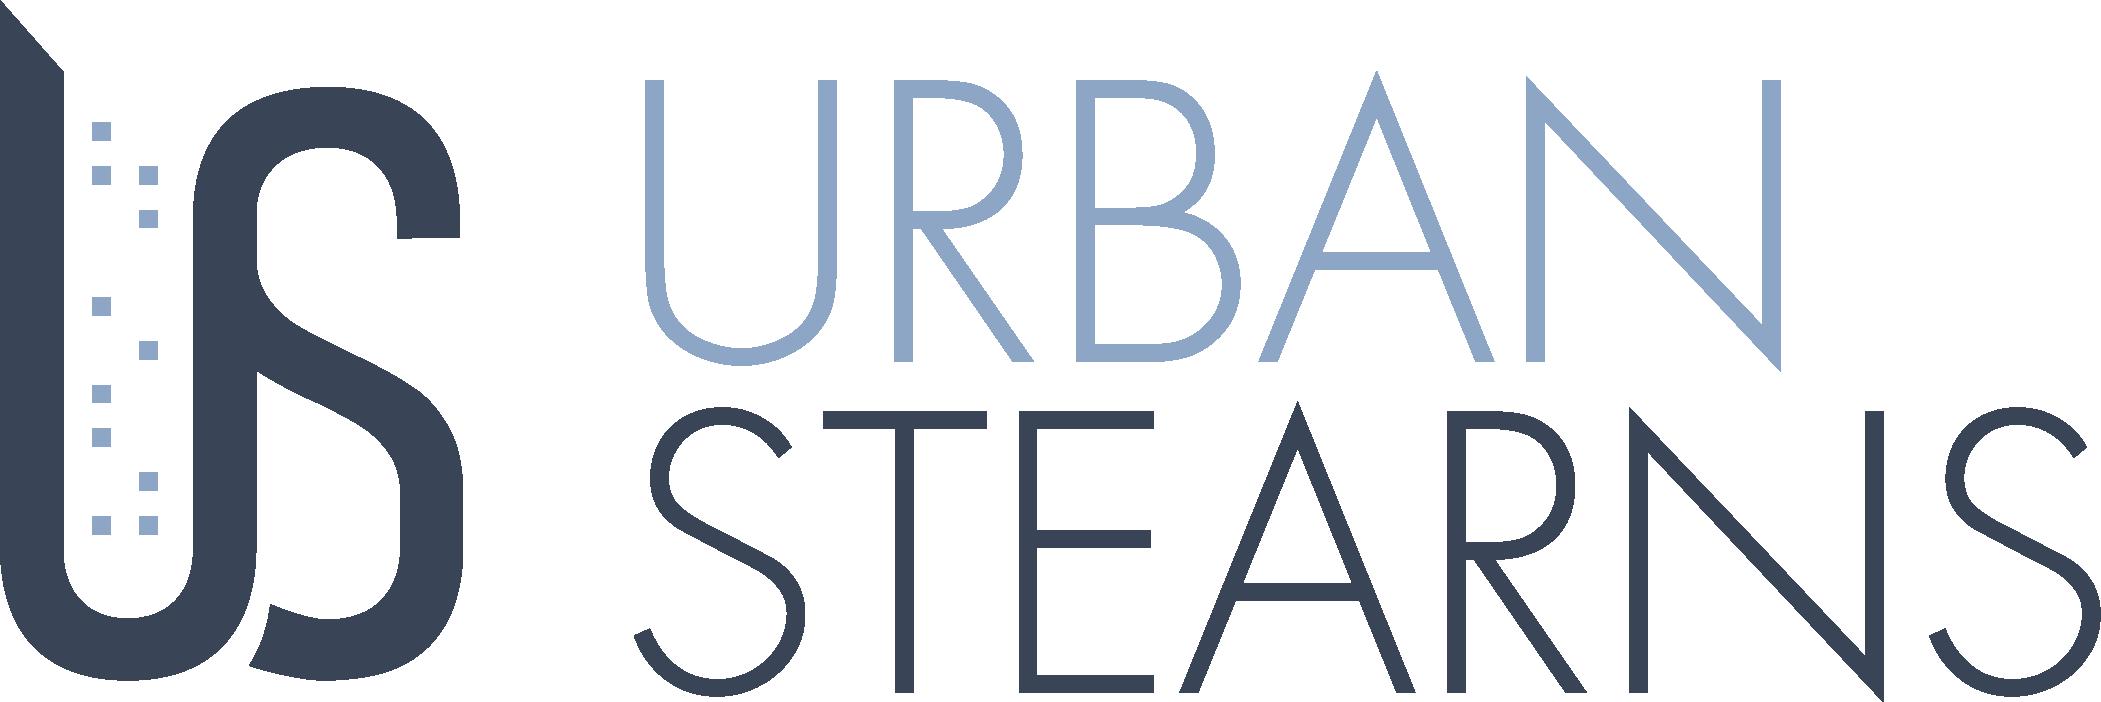 Urban Stearns